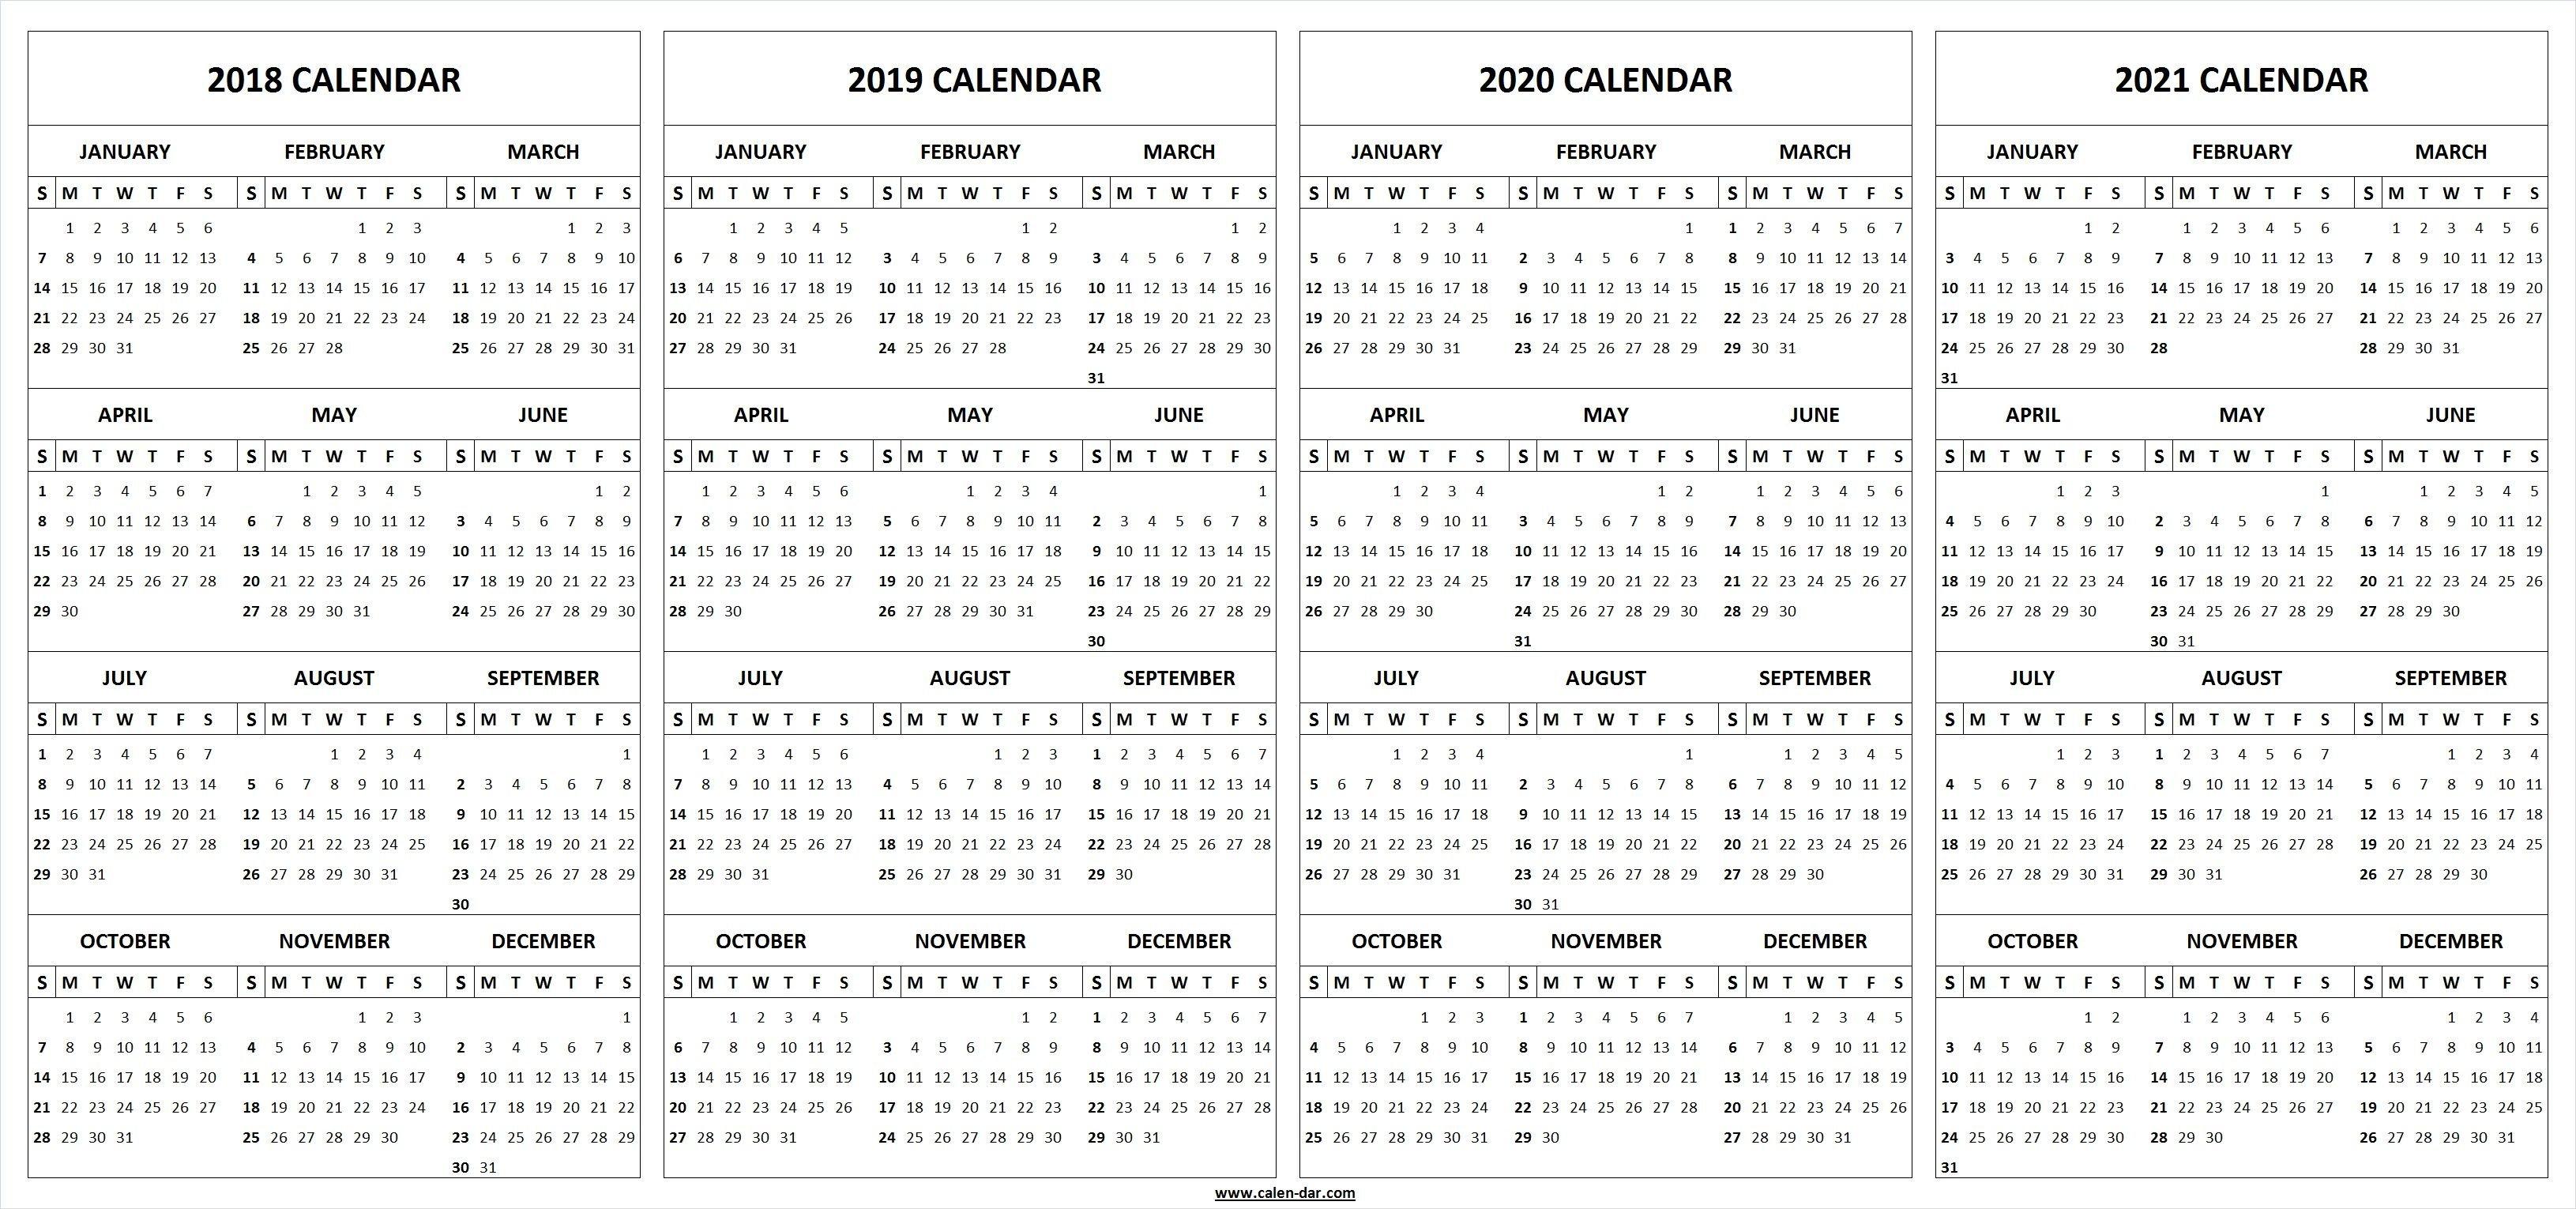 Printable 2018 2019 2020 2021 Calendar Template (With Images Printable 5 Year Calendar